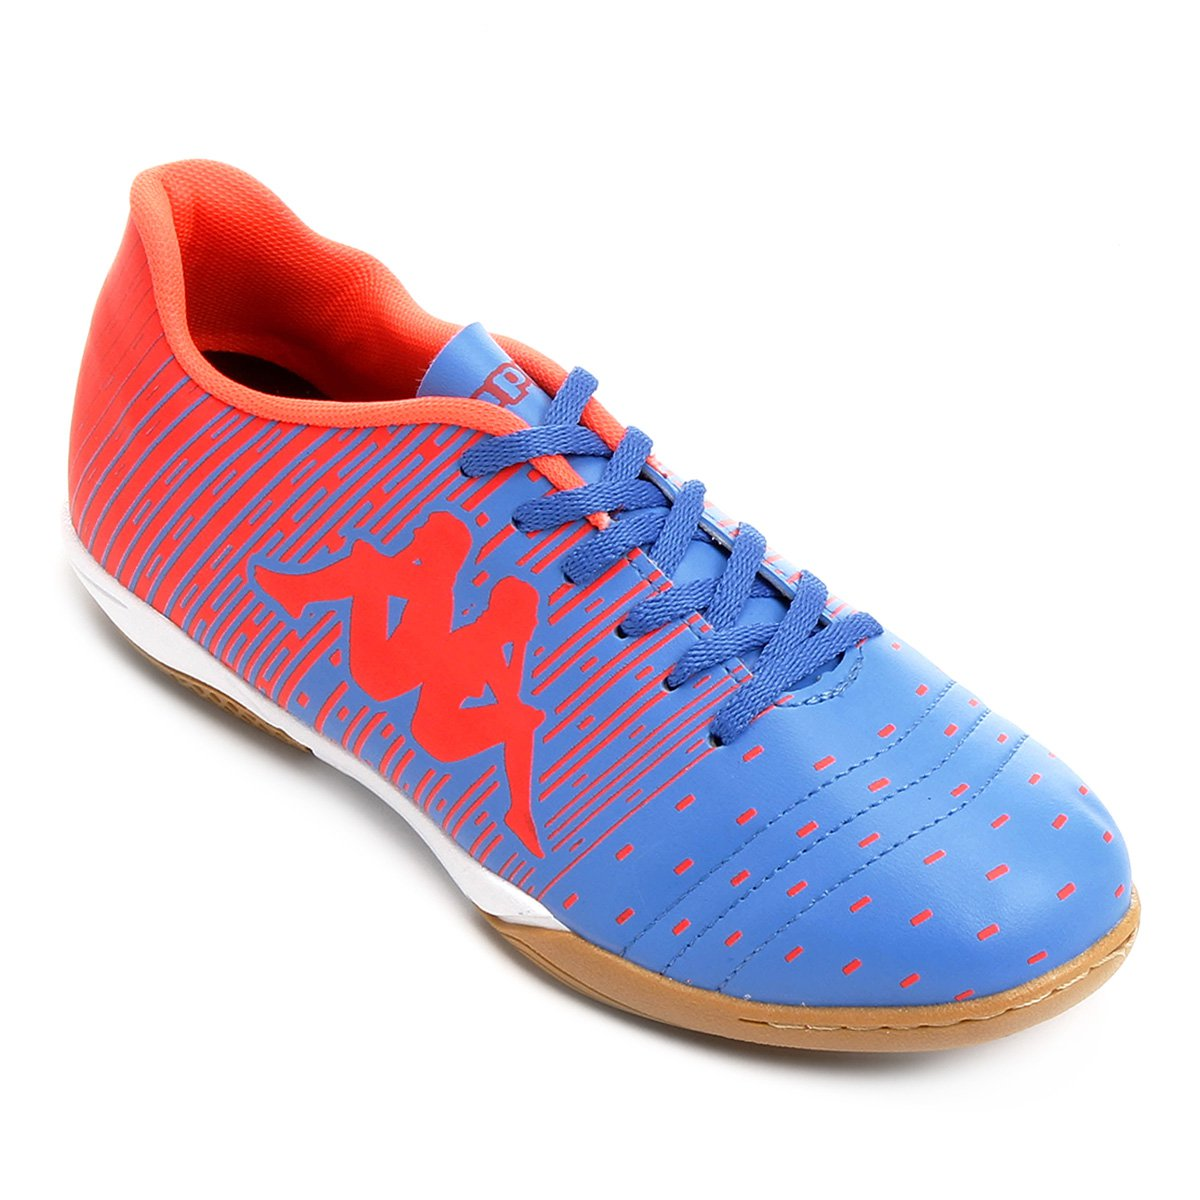 bad5f4beef 46%OFF Chuteira Futsal Kappa Adige